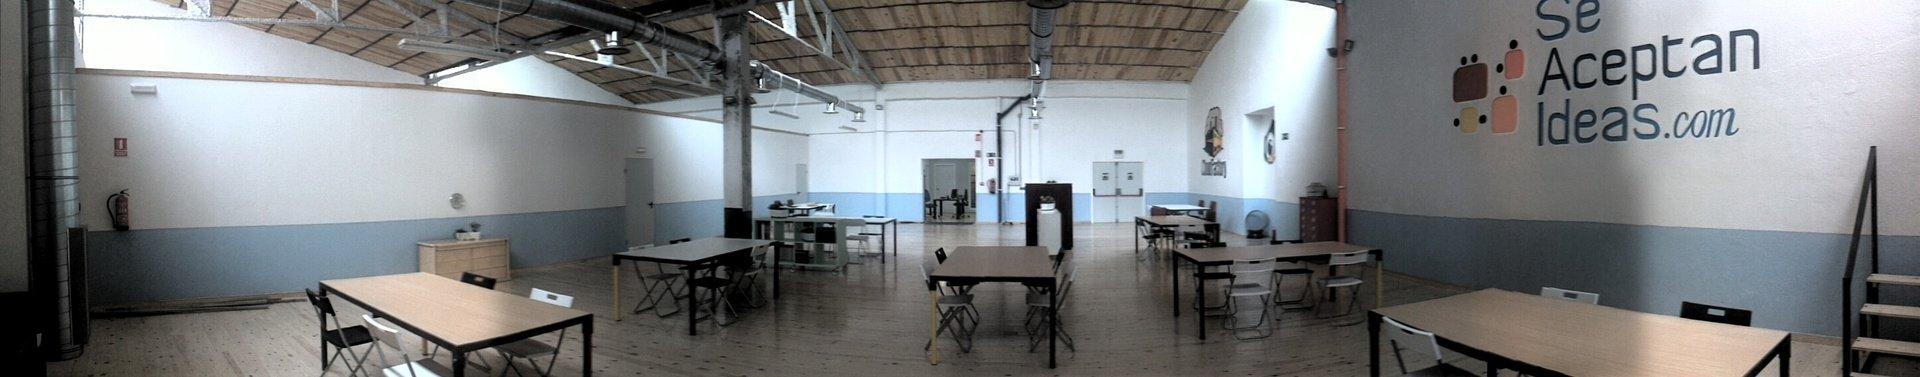 Madrid training rooms Espace de Coworking Seaceptanideas image 0